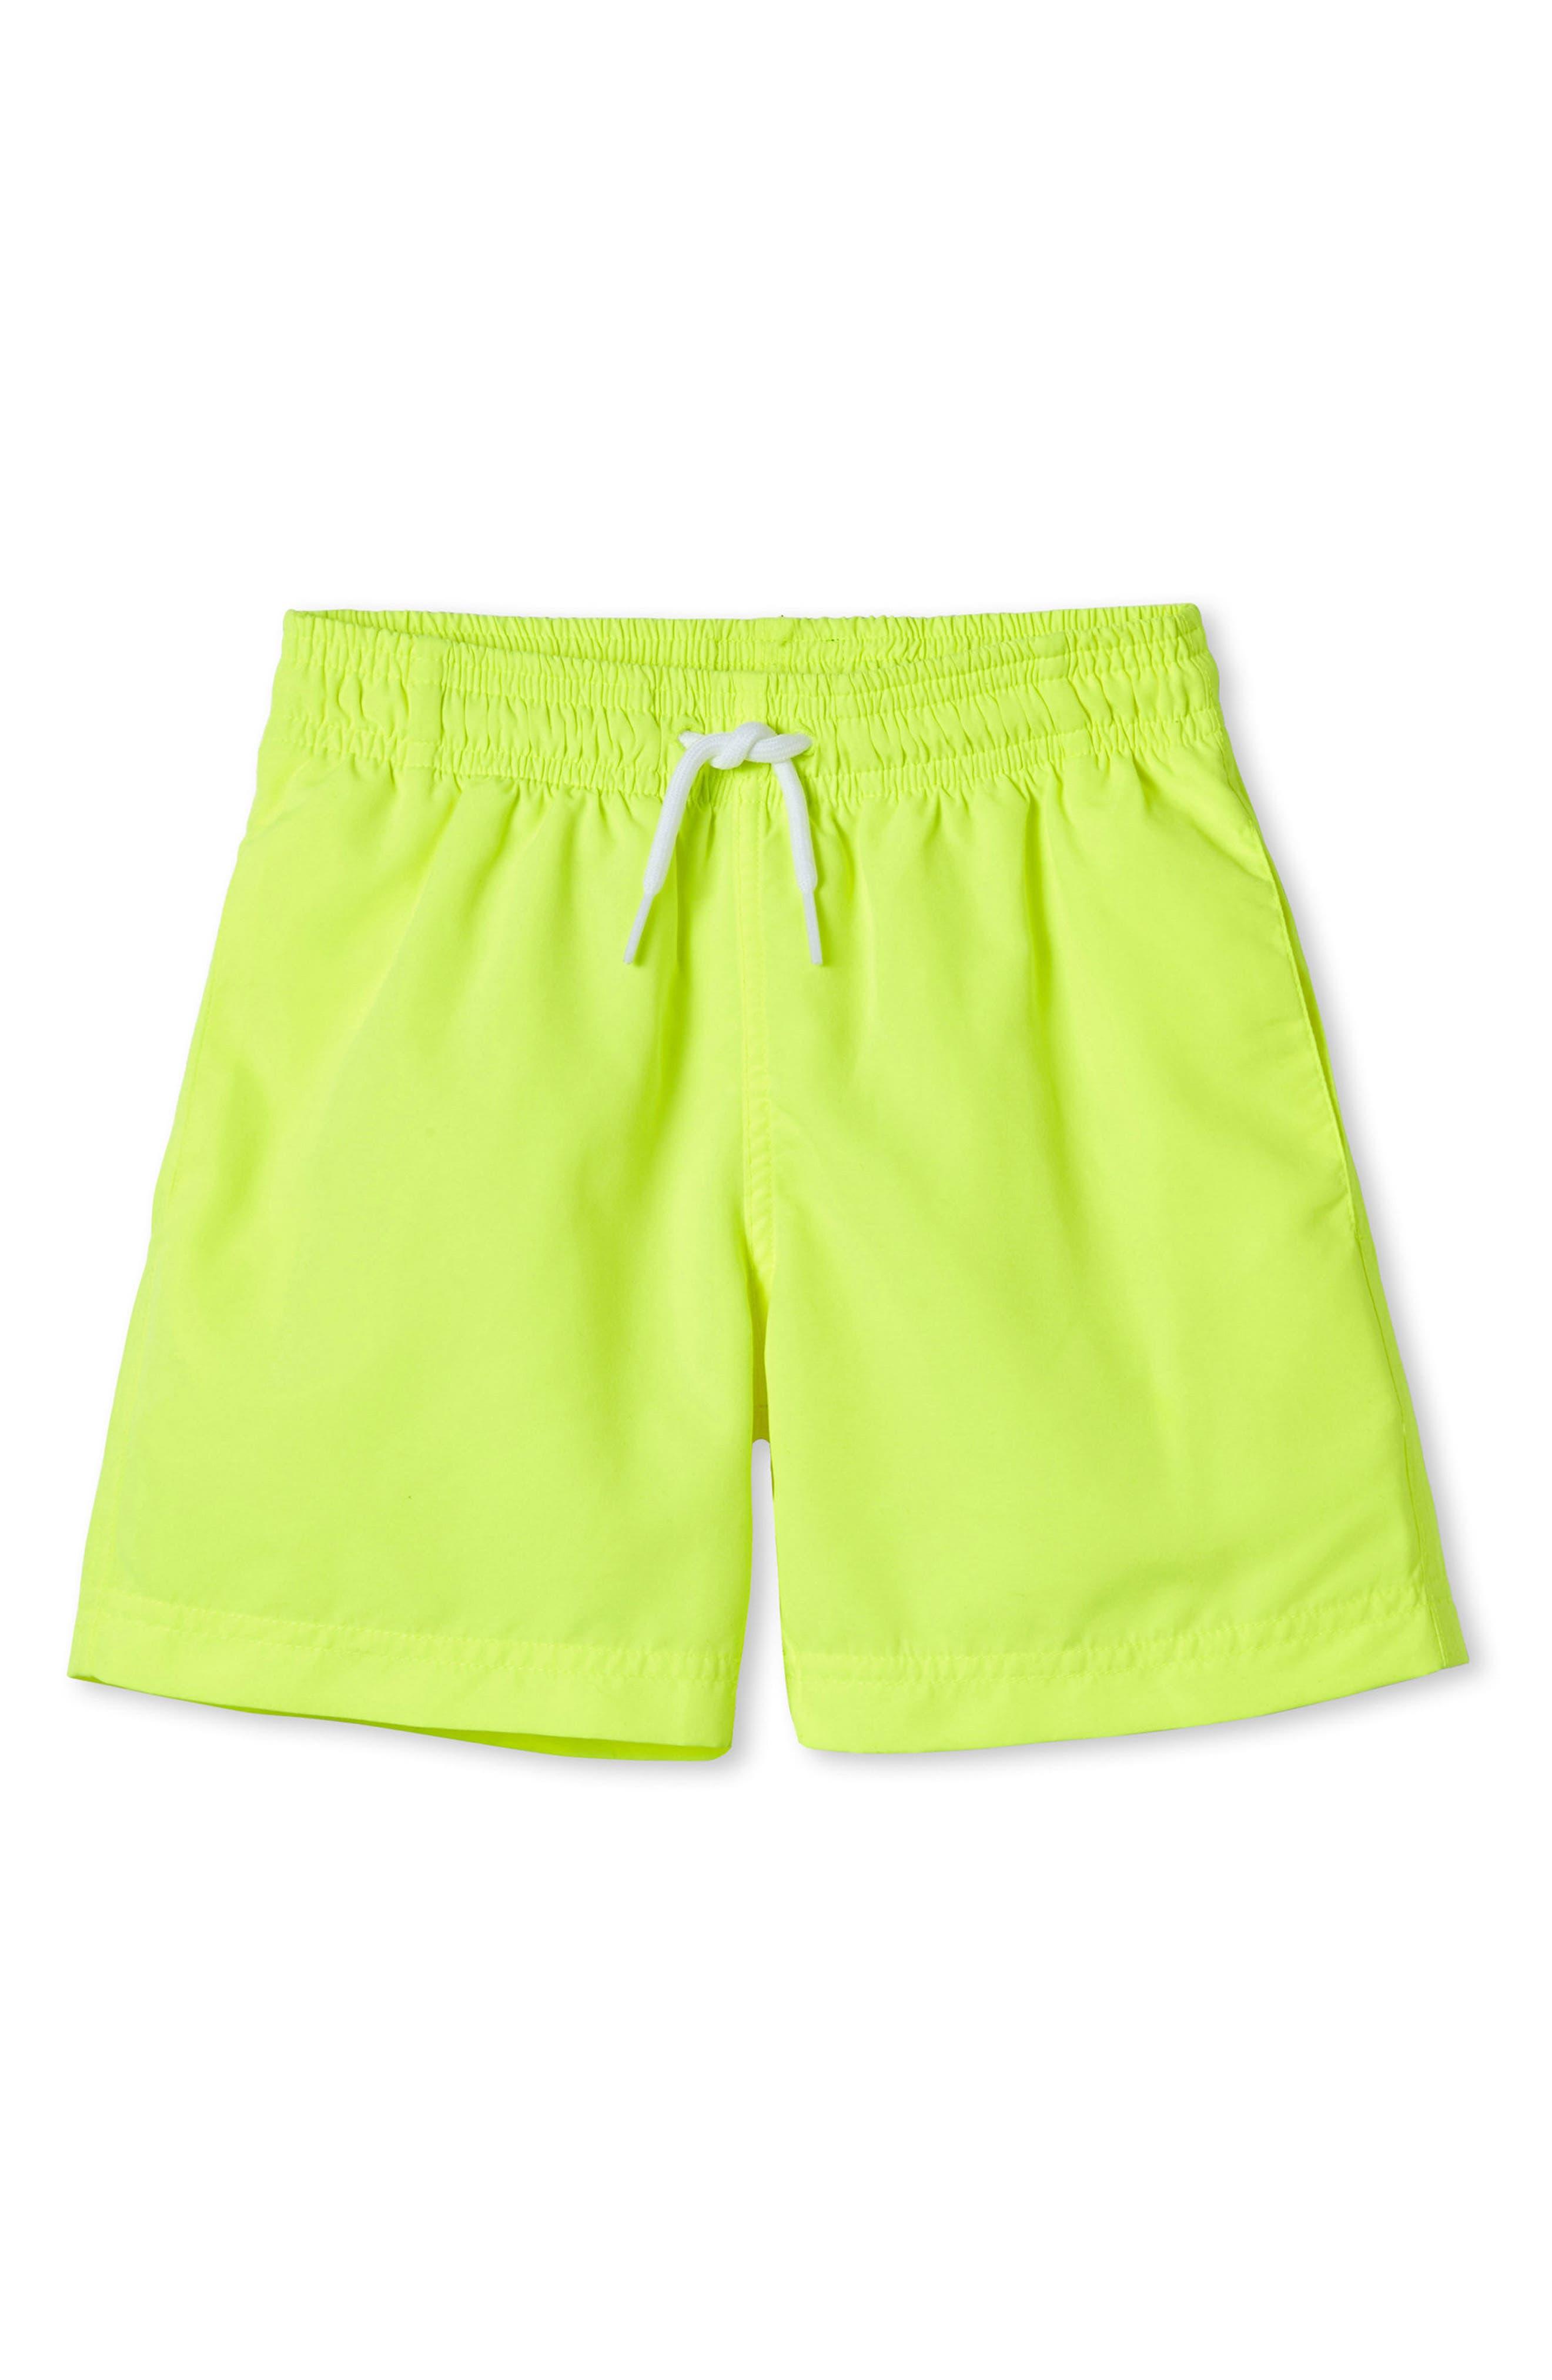 Neon Yellow Swim Trunks,                             Main thumbnail 1, color,                             750